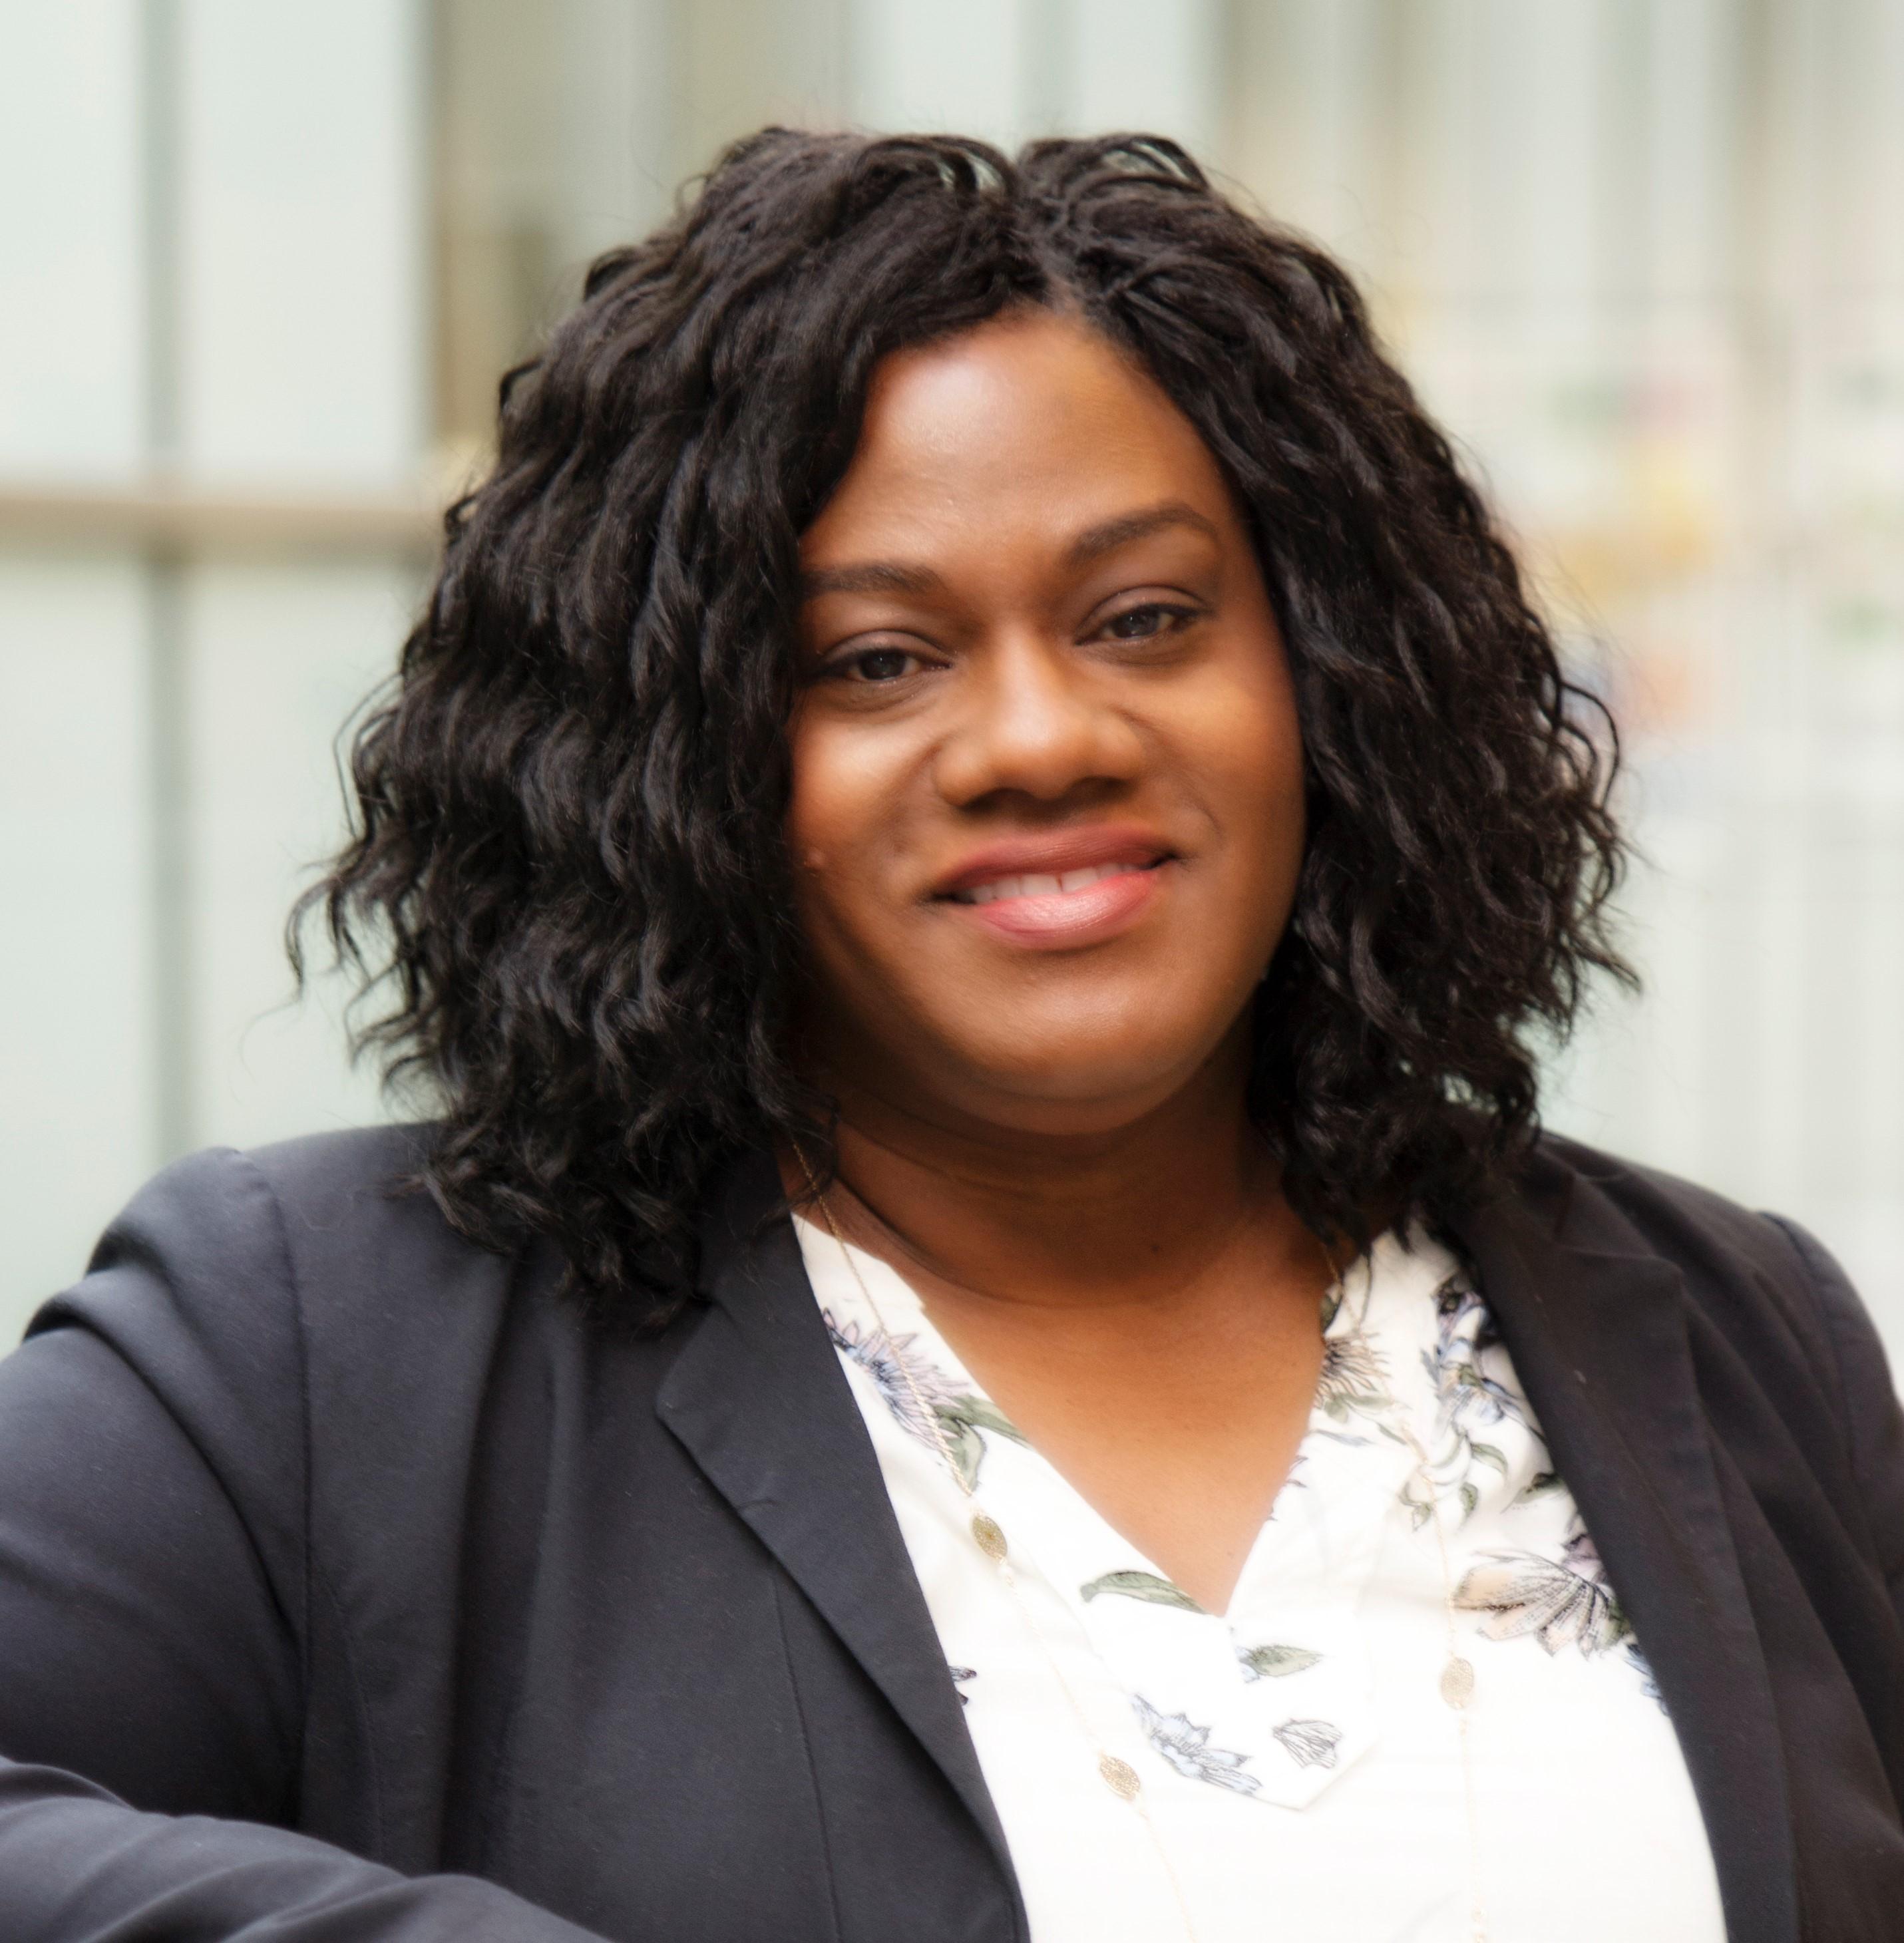 Dr. Tisha Greene